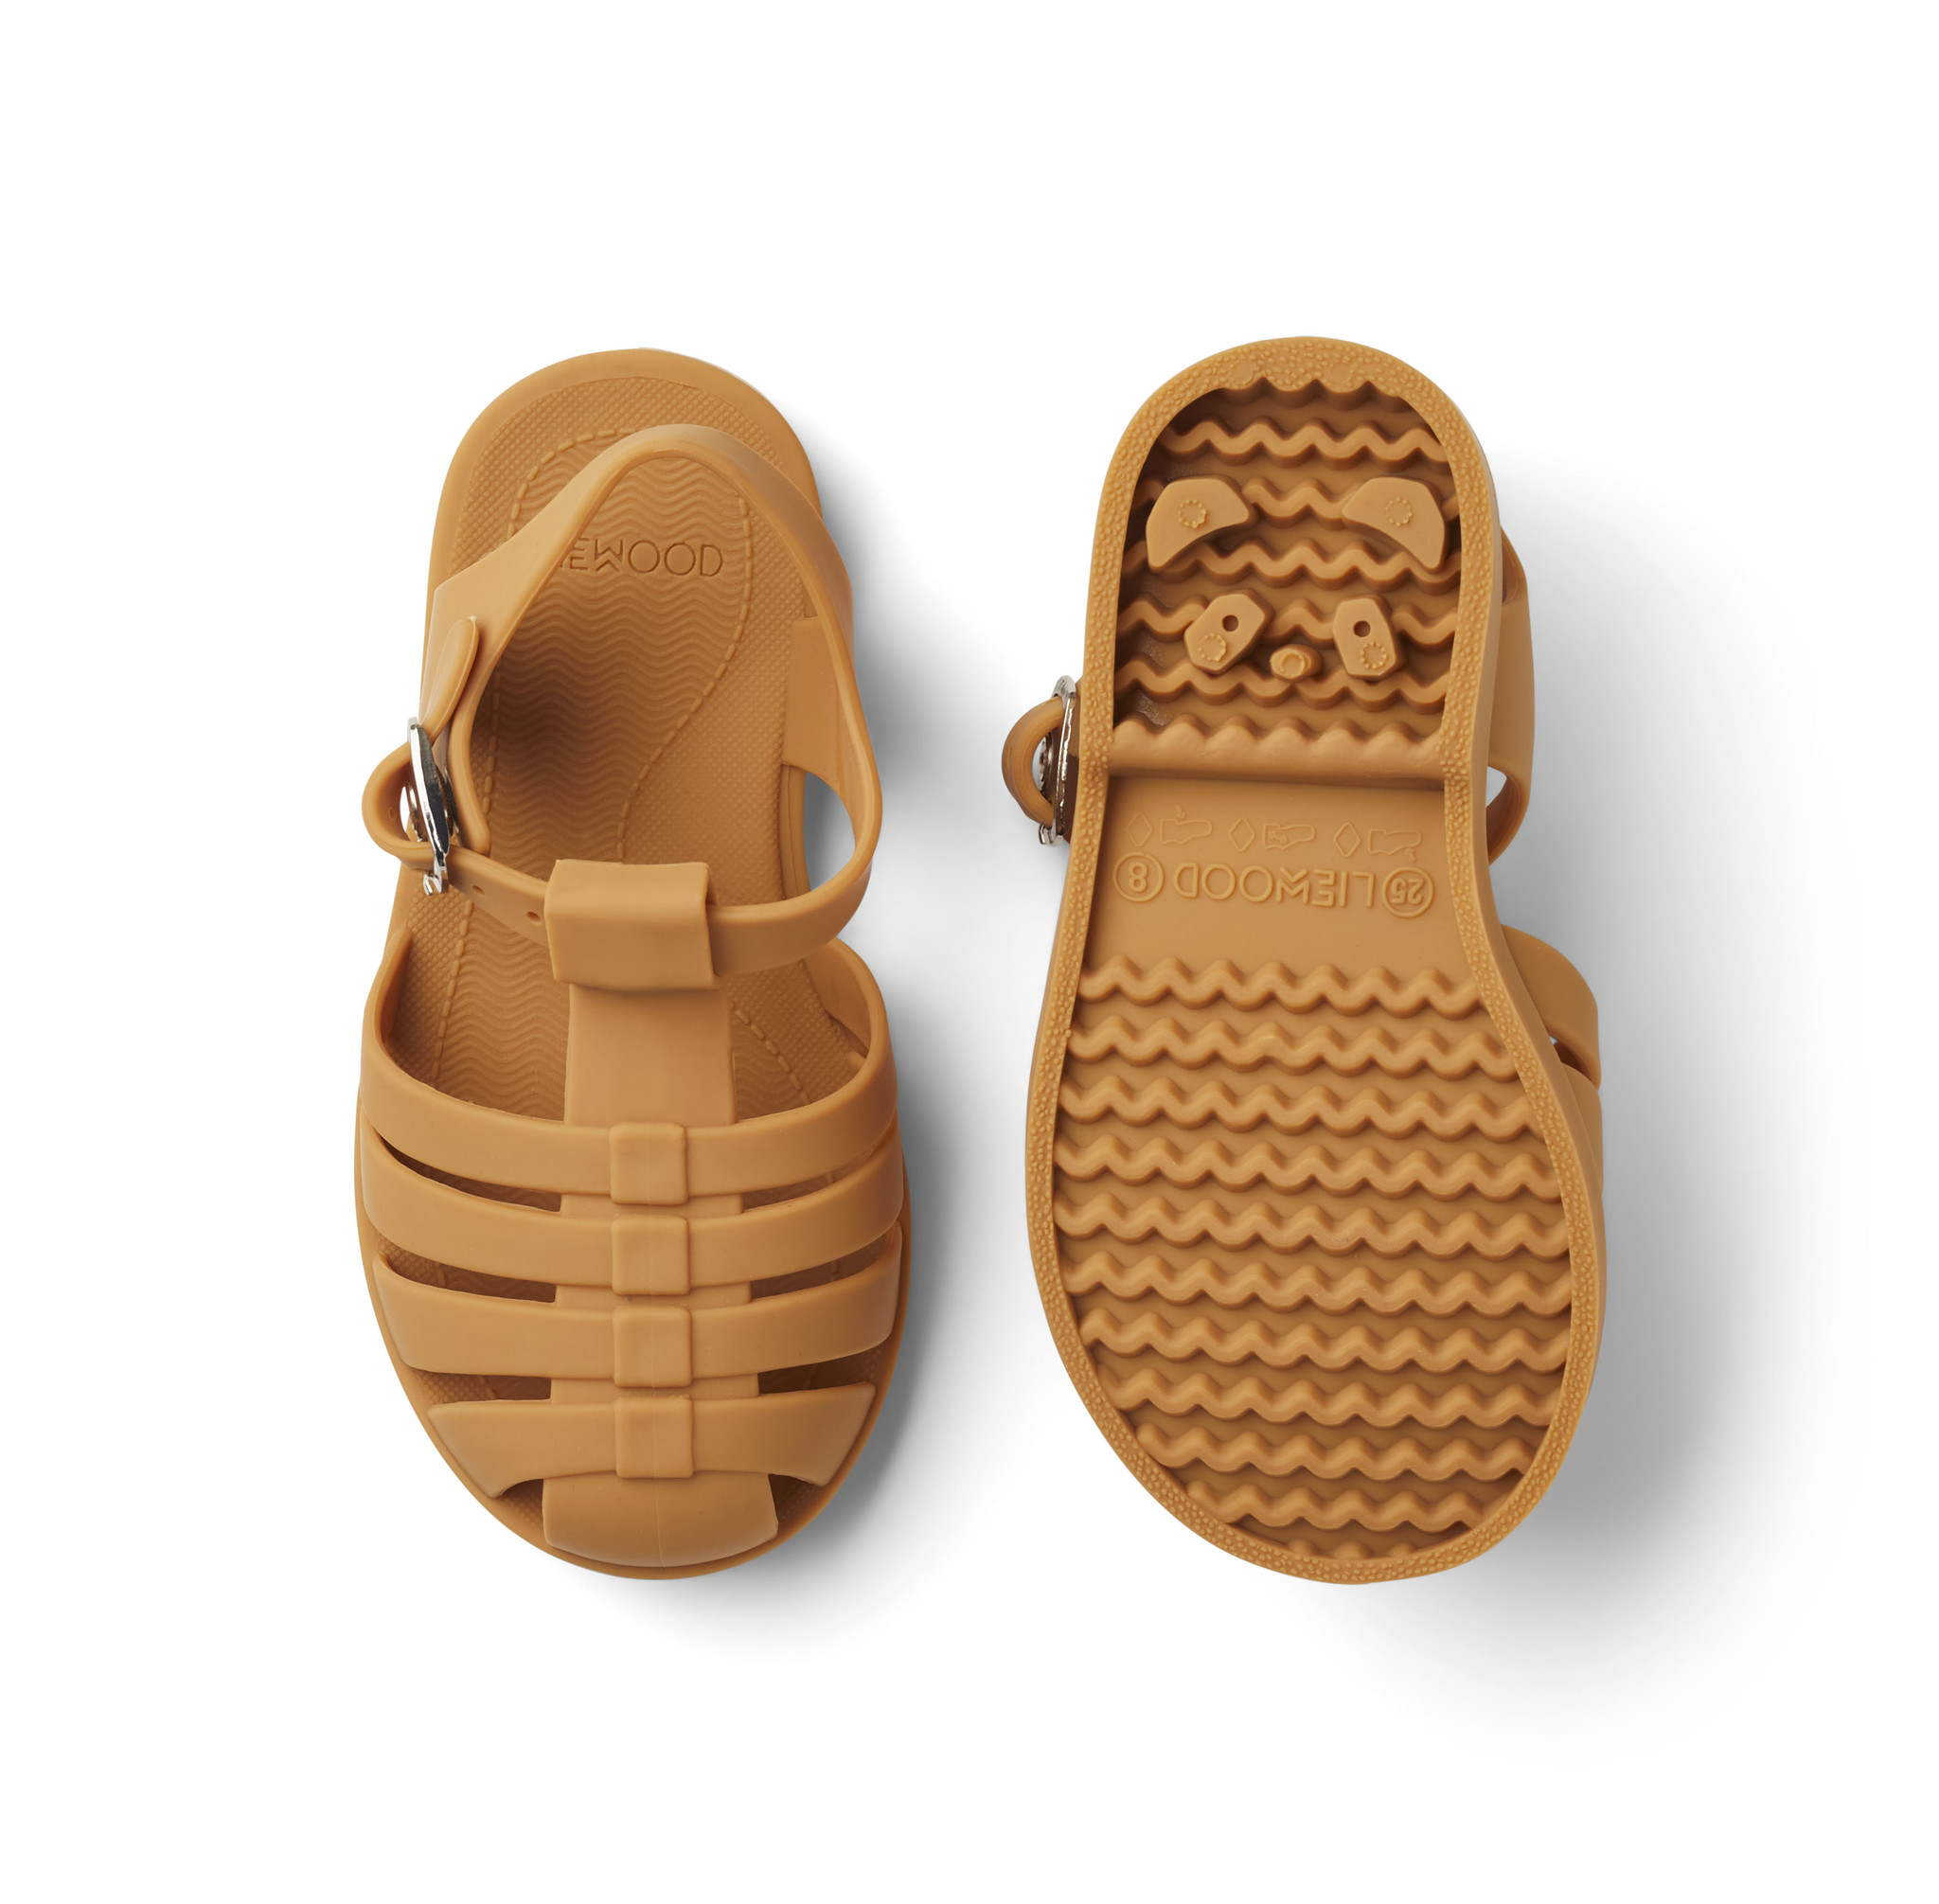 Bre Sandals - Mustard-2